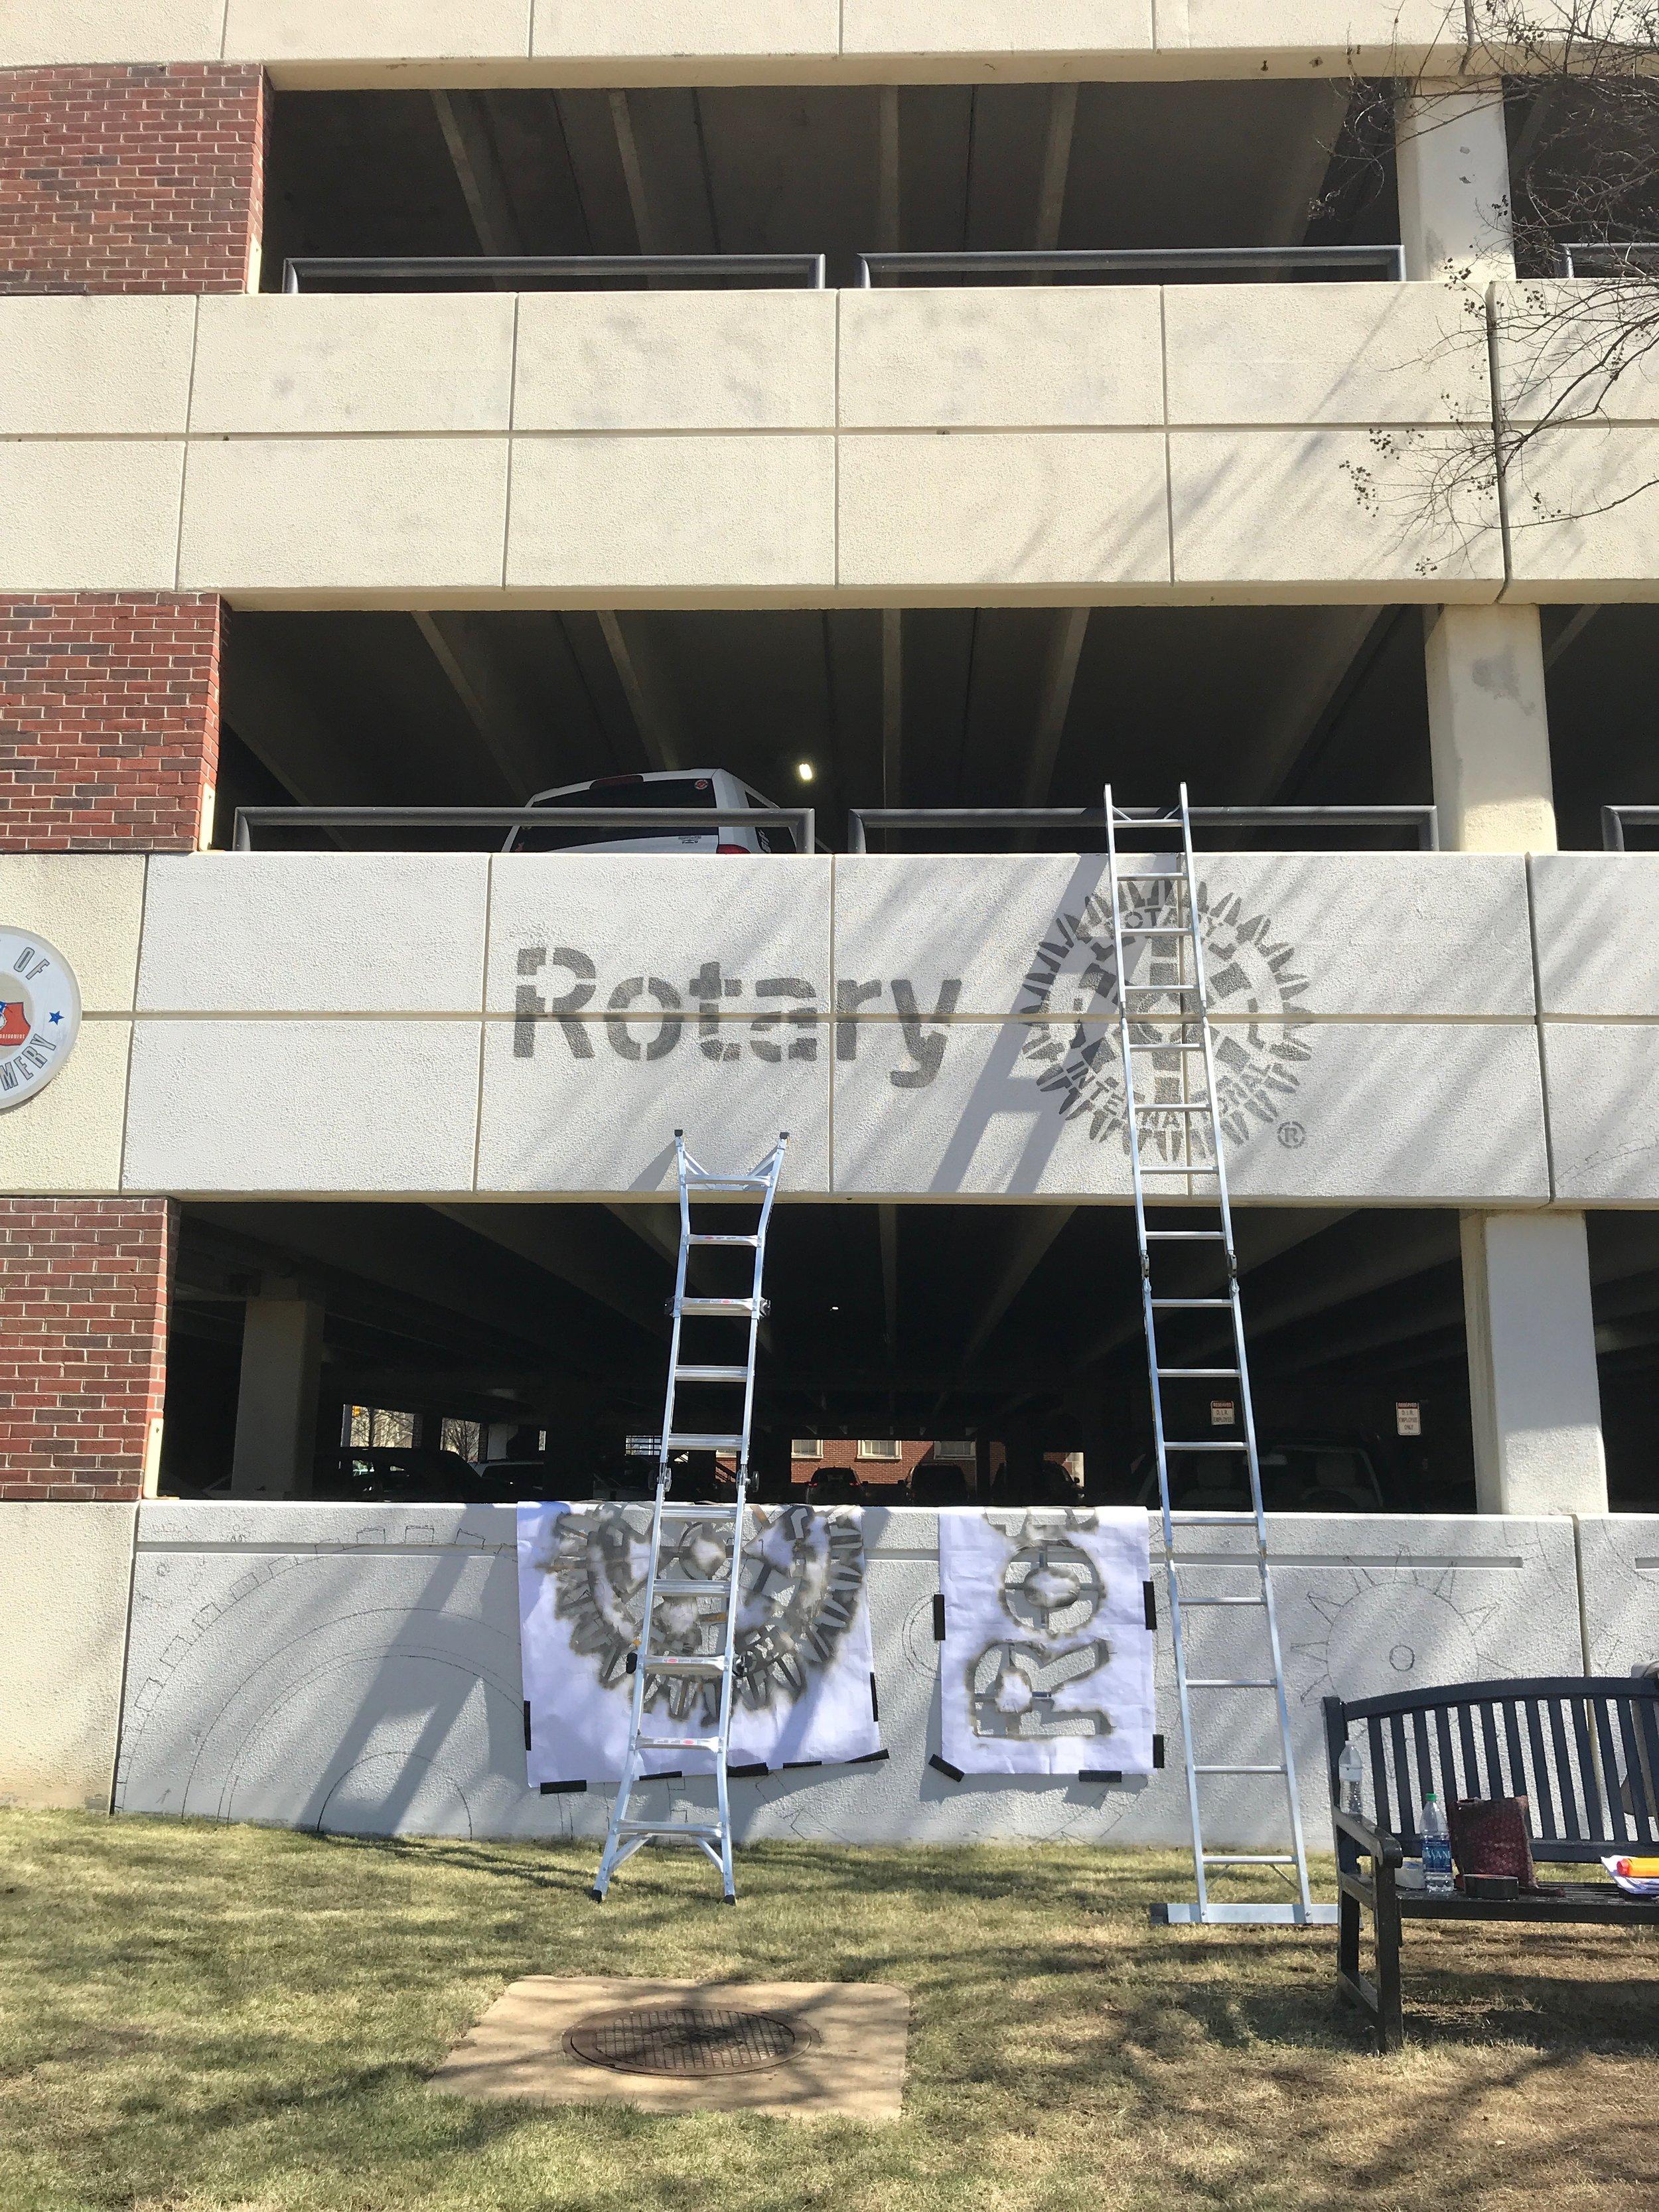 Day Four: Rotary Club logo stencil goes up!